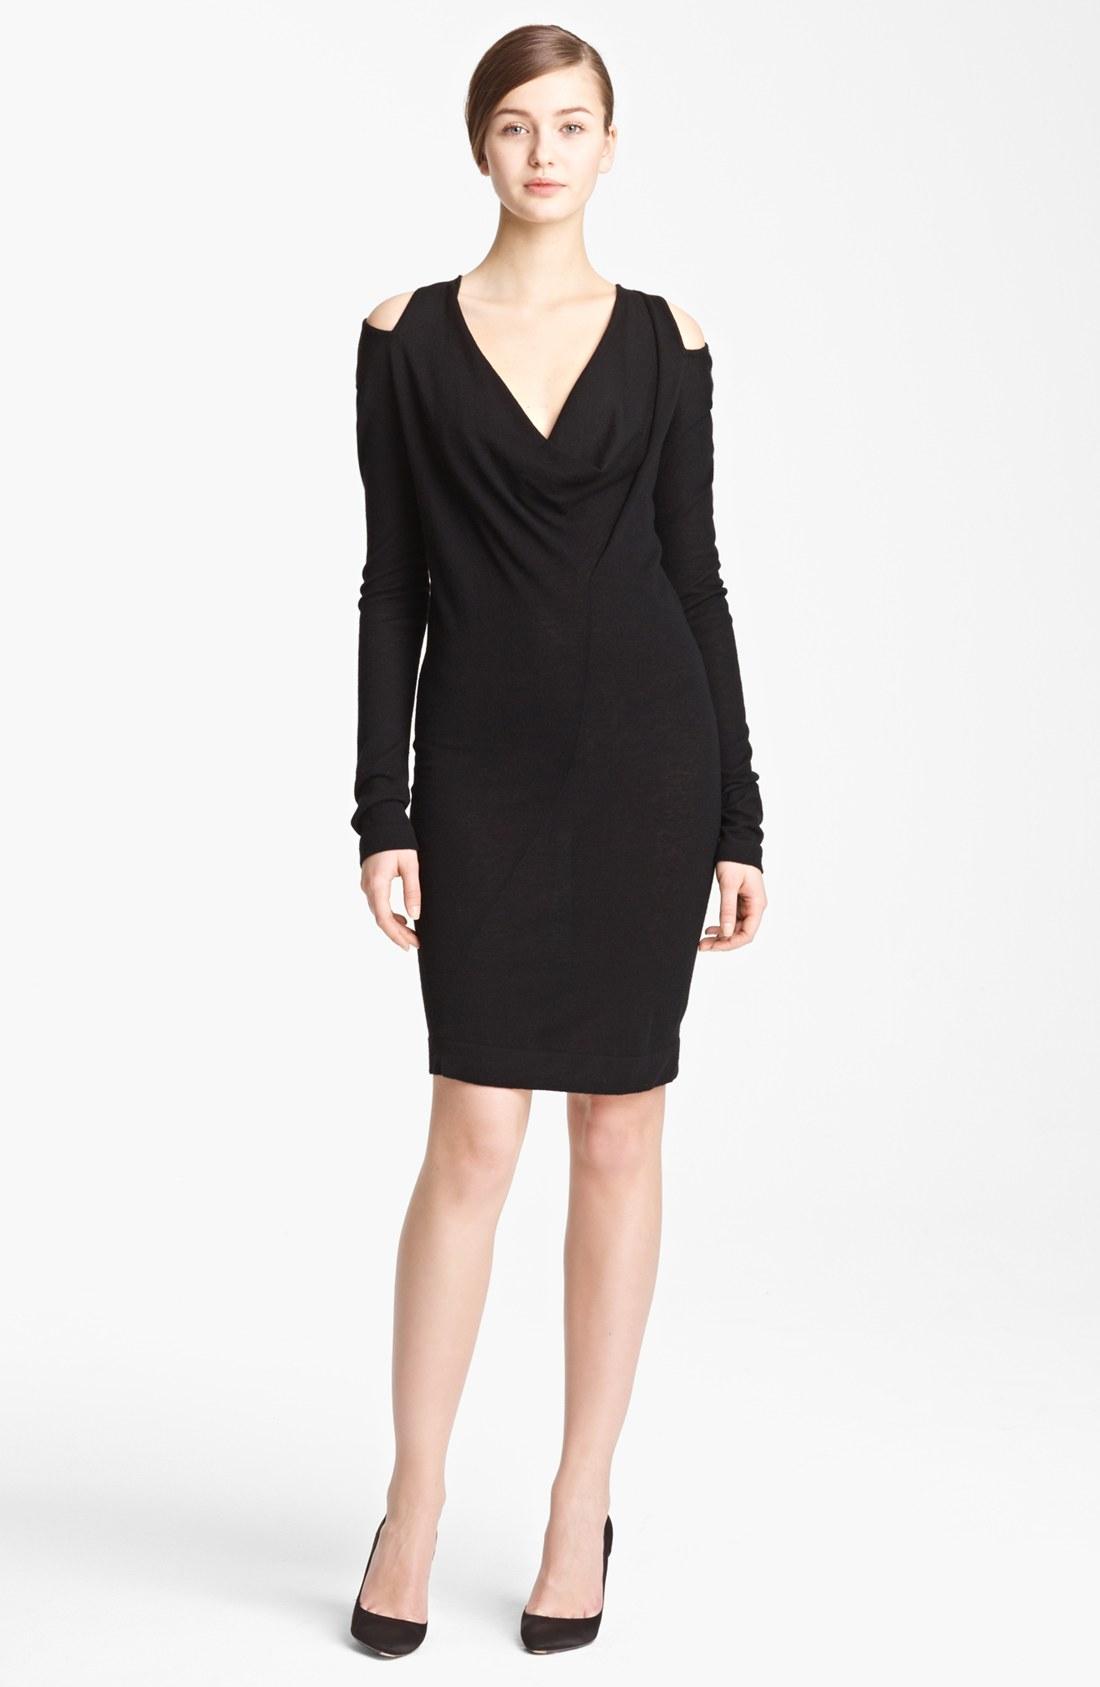 Donna karan new york collection twist tunic dress in black for Donna karan new york